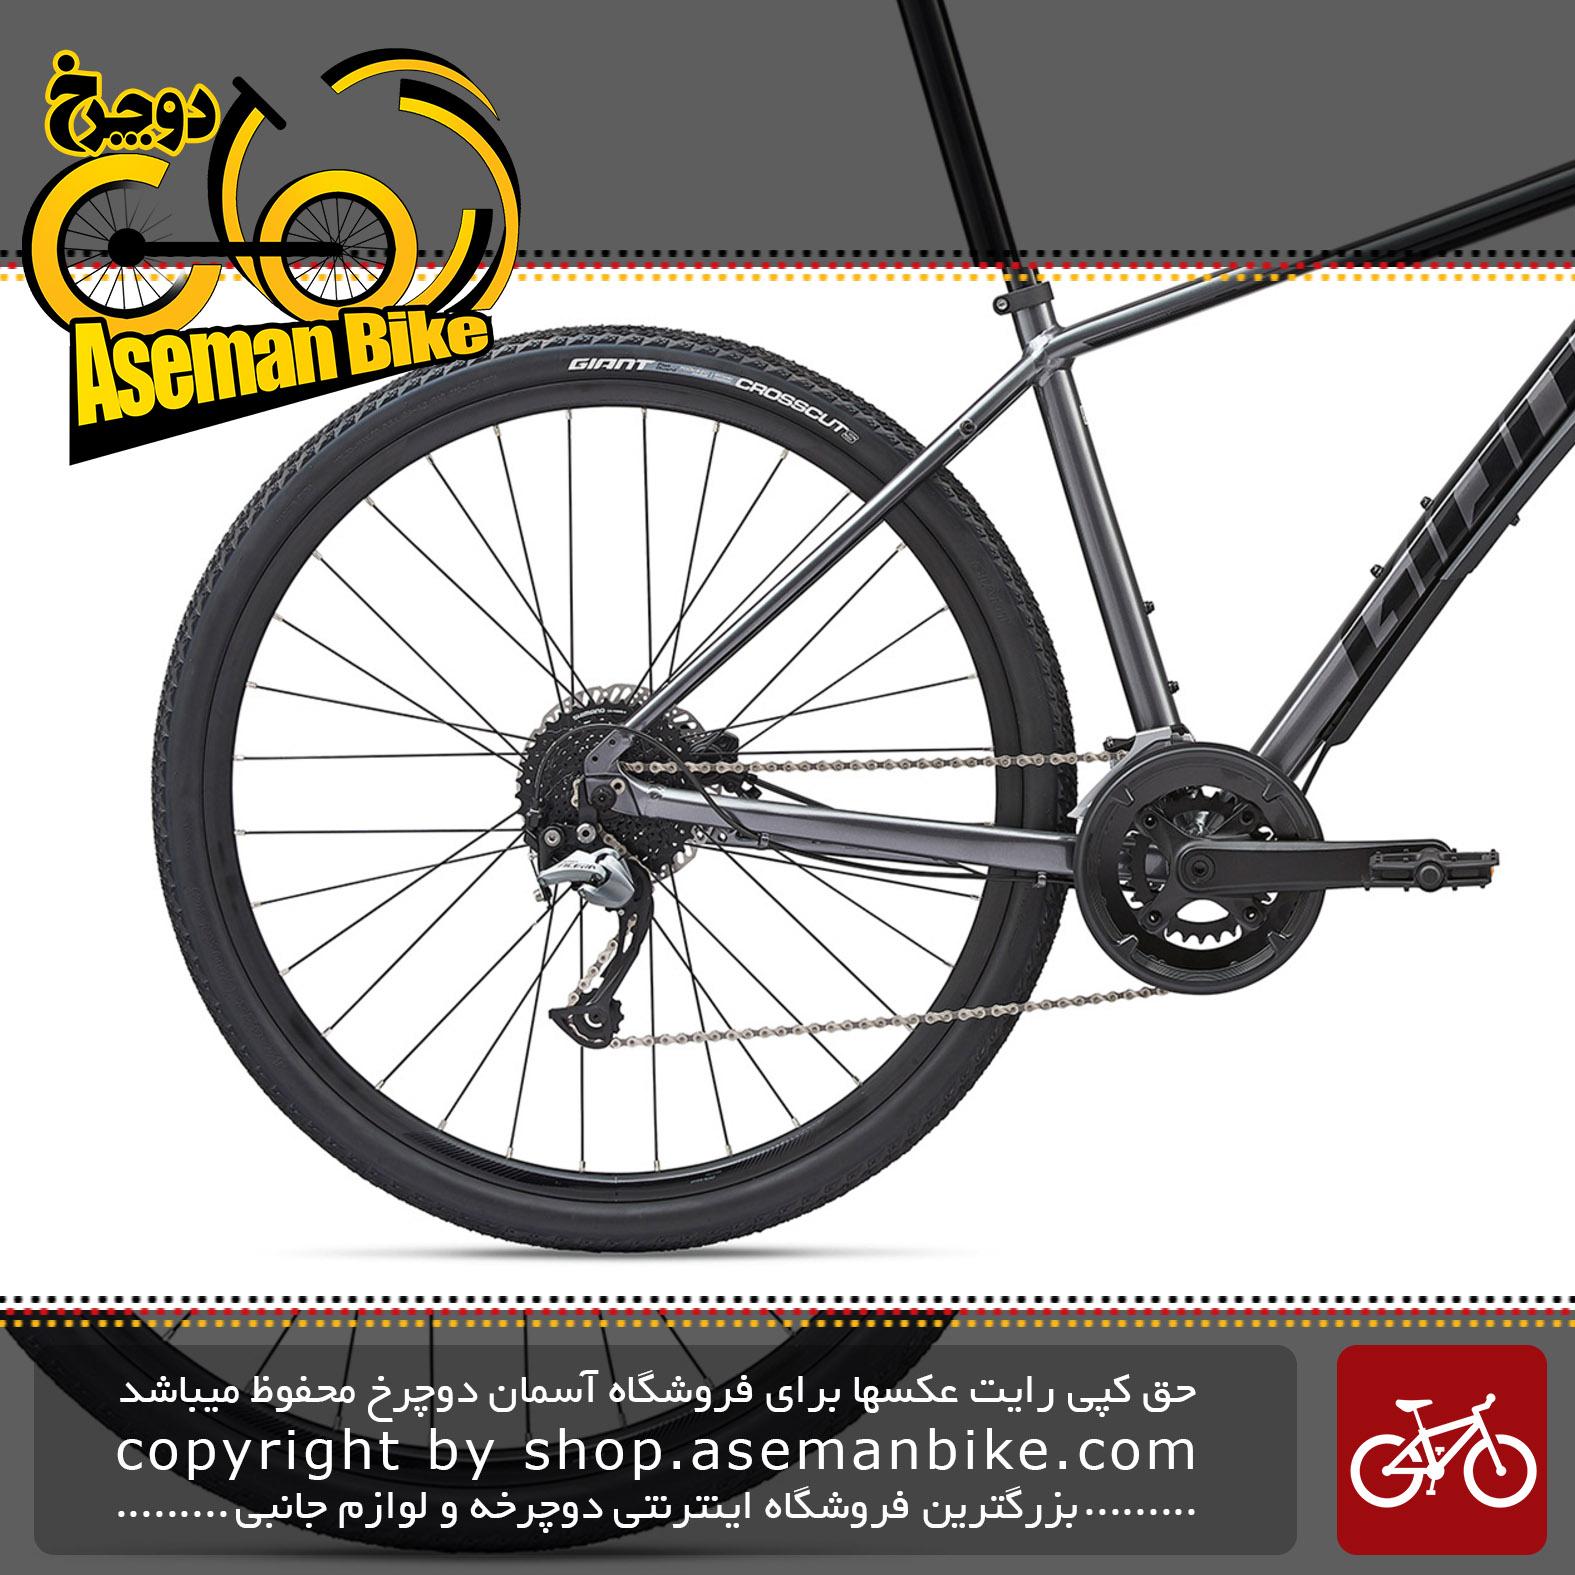 دوچرخه دومنظوره جاینت مدل روآم 2 دیسک هیدرولیک 2020 Giant Adventure Bicycle Roam 2 Disc 2020